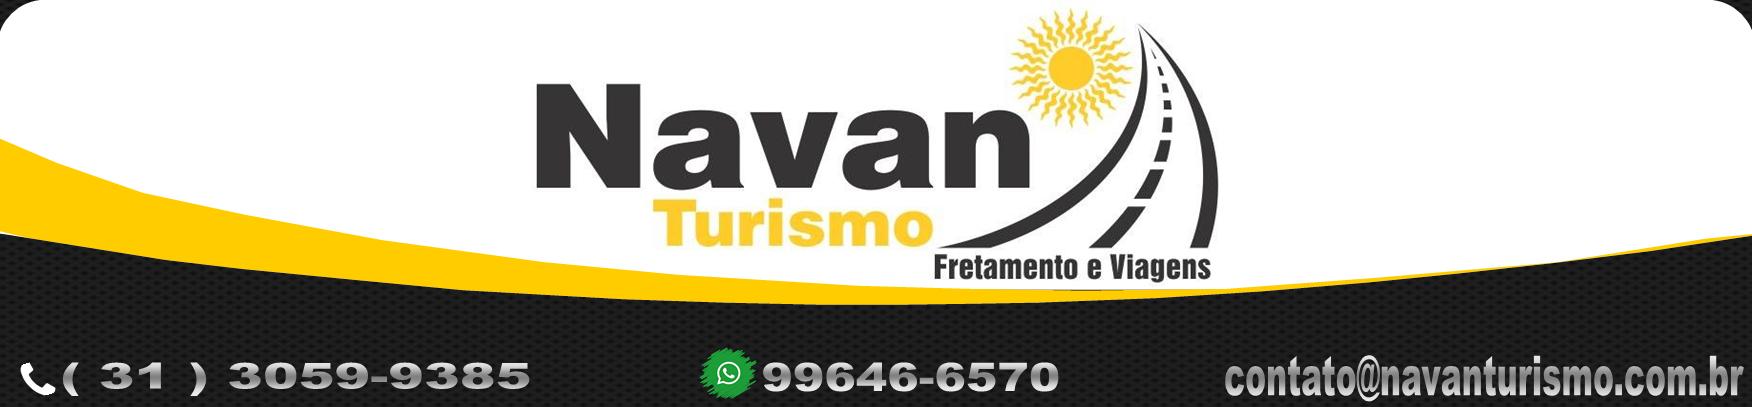 Navan Turismo